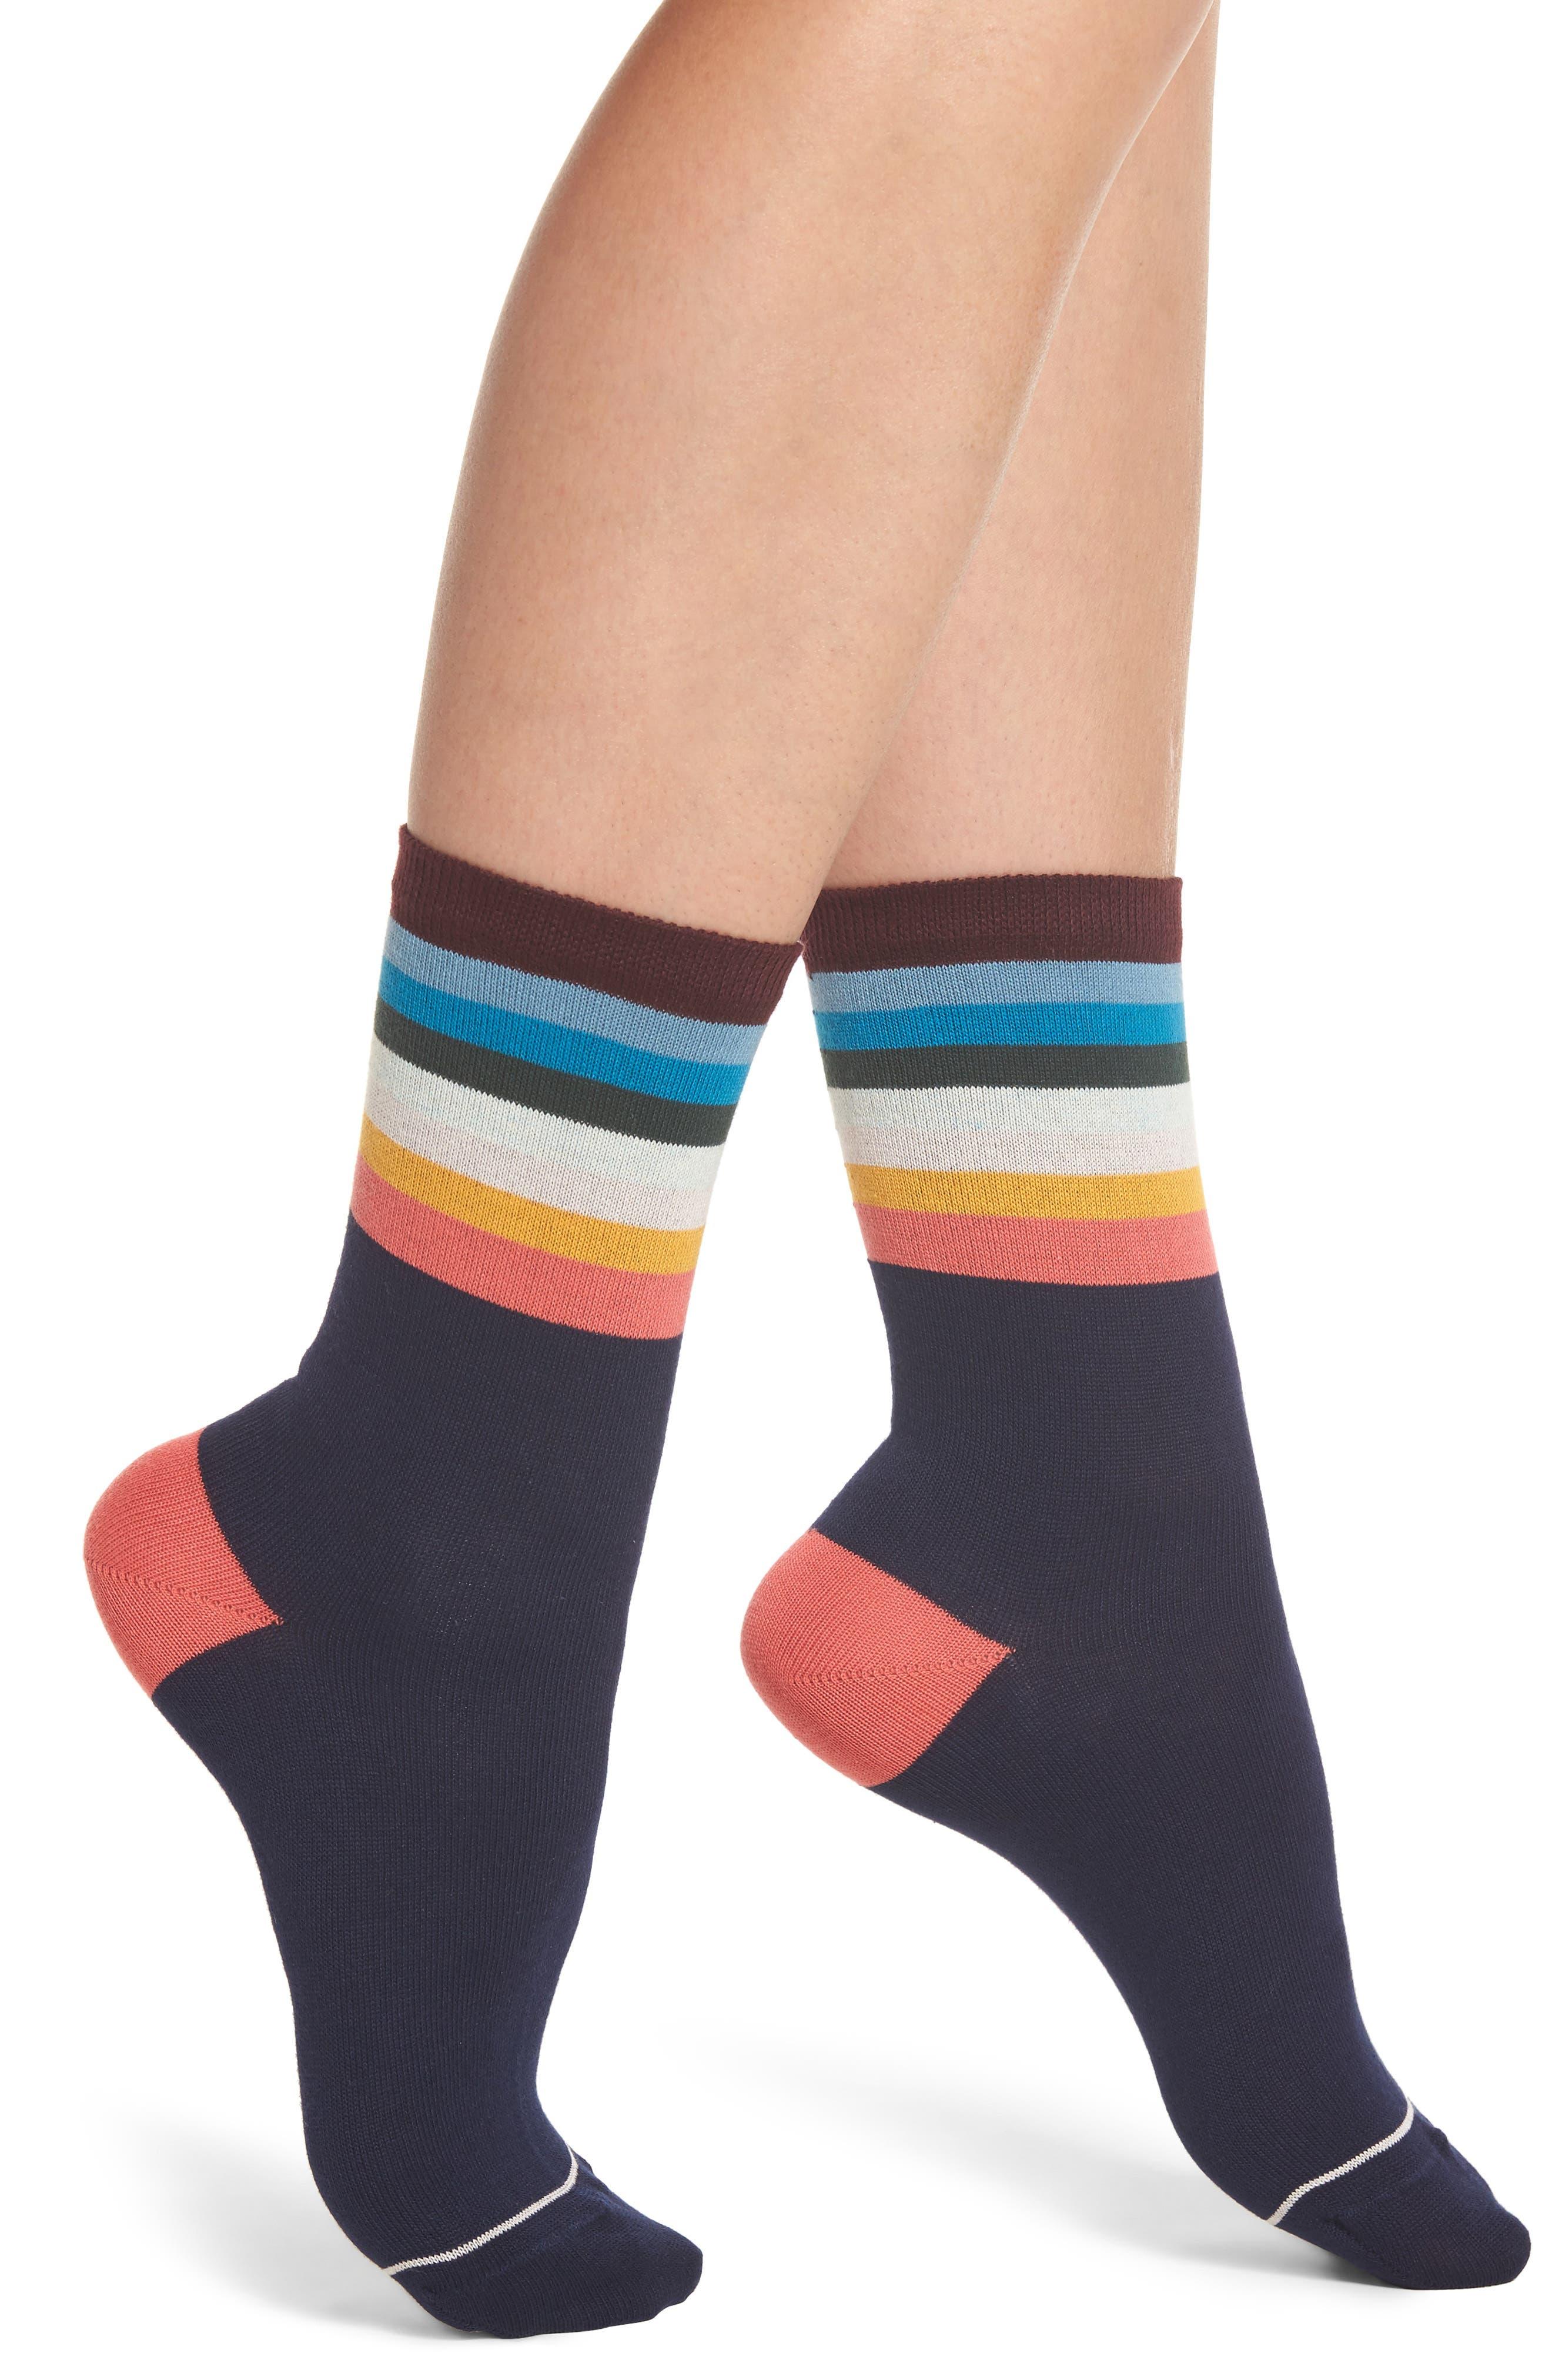 Cindy Artist Stripe Ankle Socks,                             Main thumbnail 1, color,                             Navy